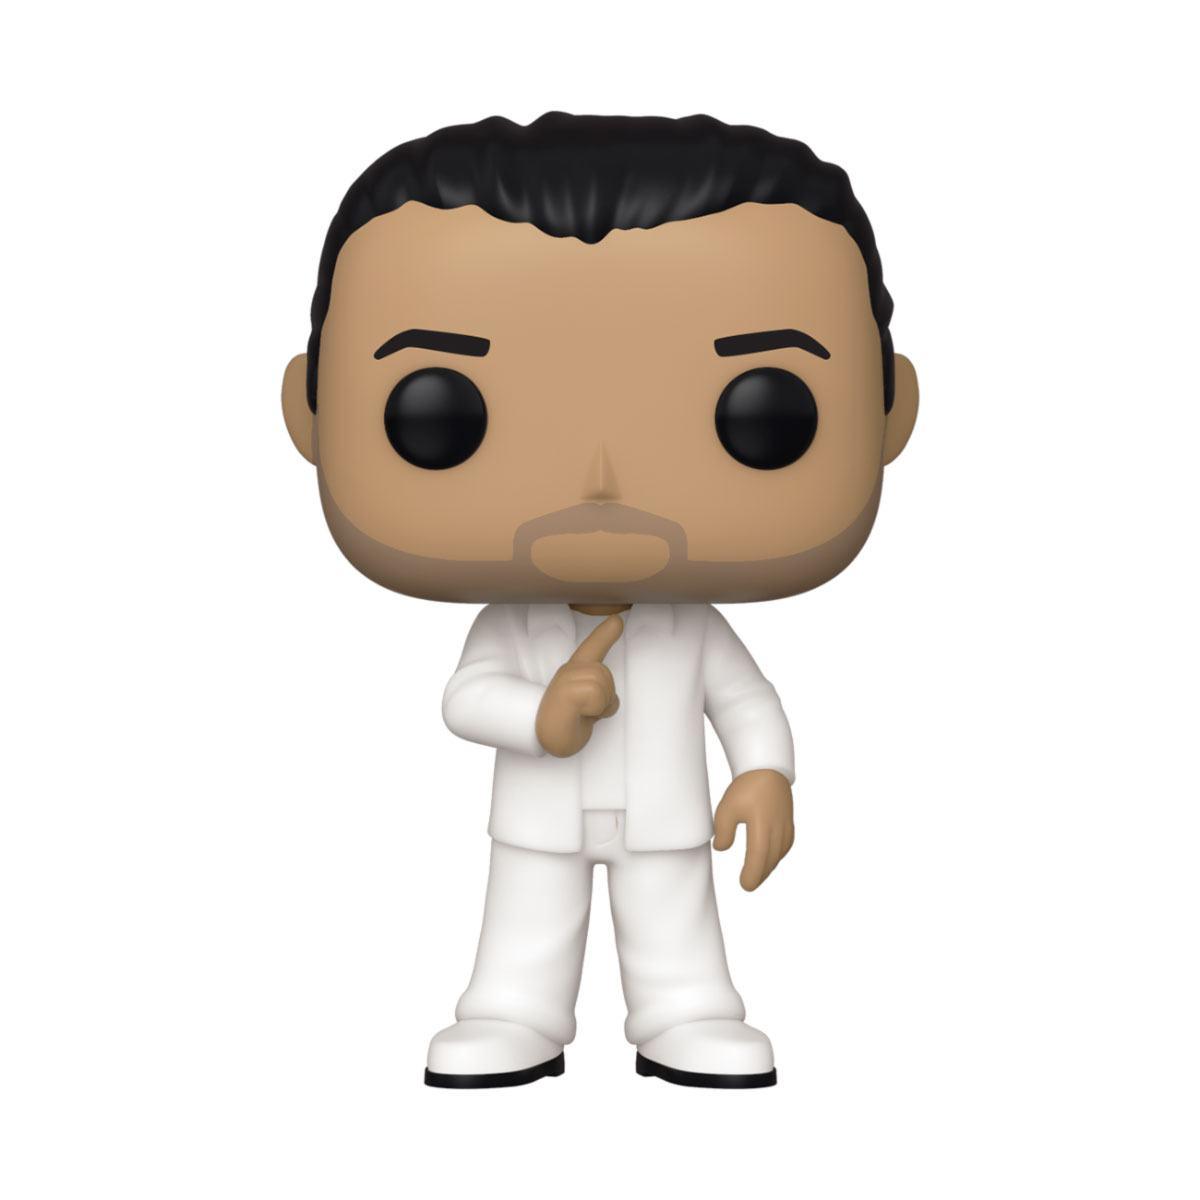 Backstreet Boys POP! Rocks Vinyl Figure Howie Dorough 9 cm